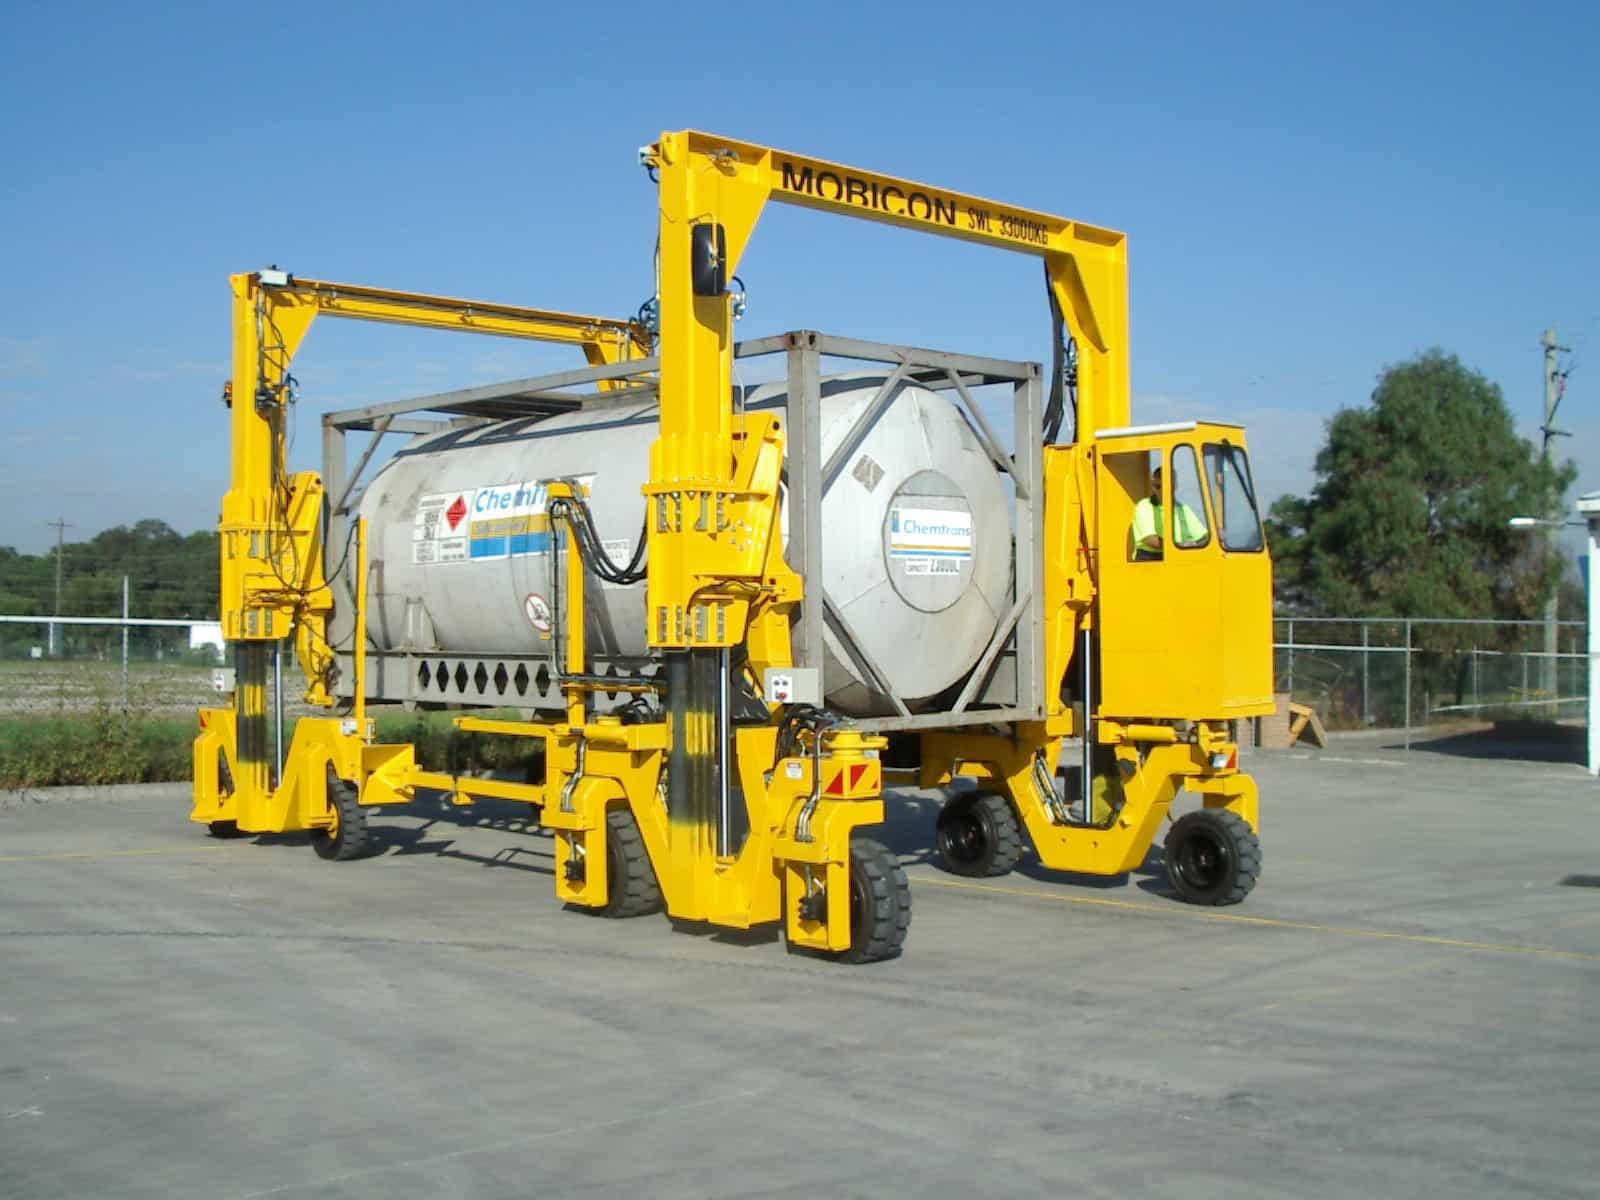 BLTWORLD - Mobicon mobile container handler